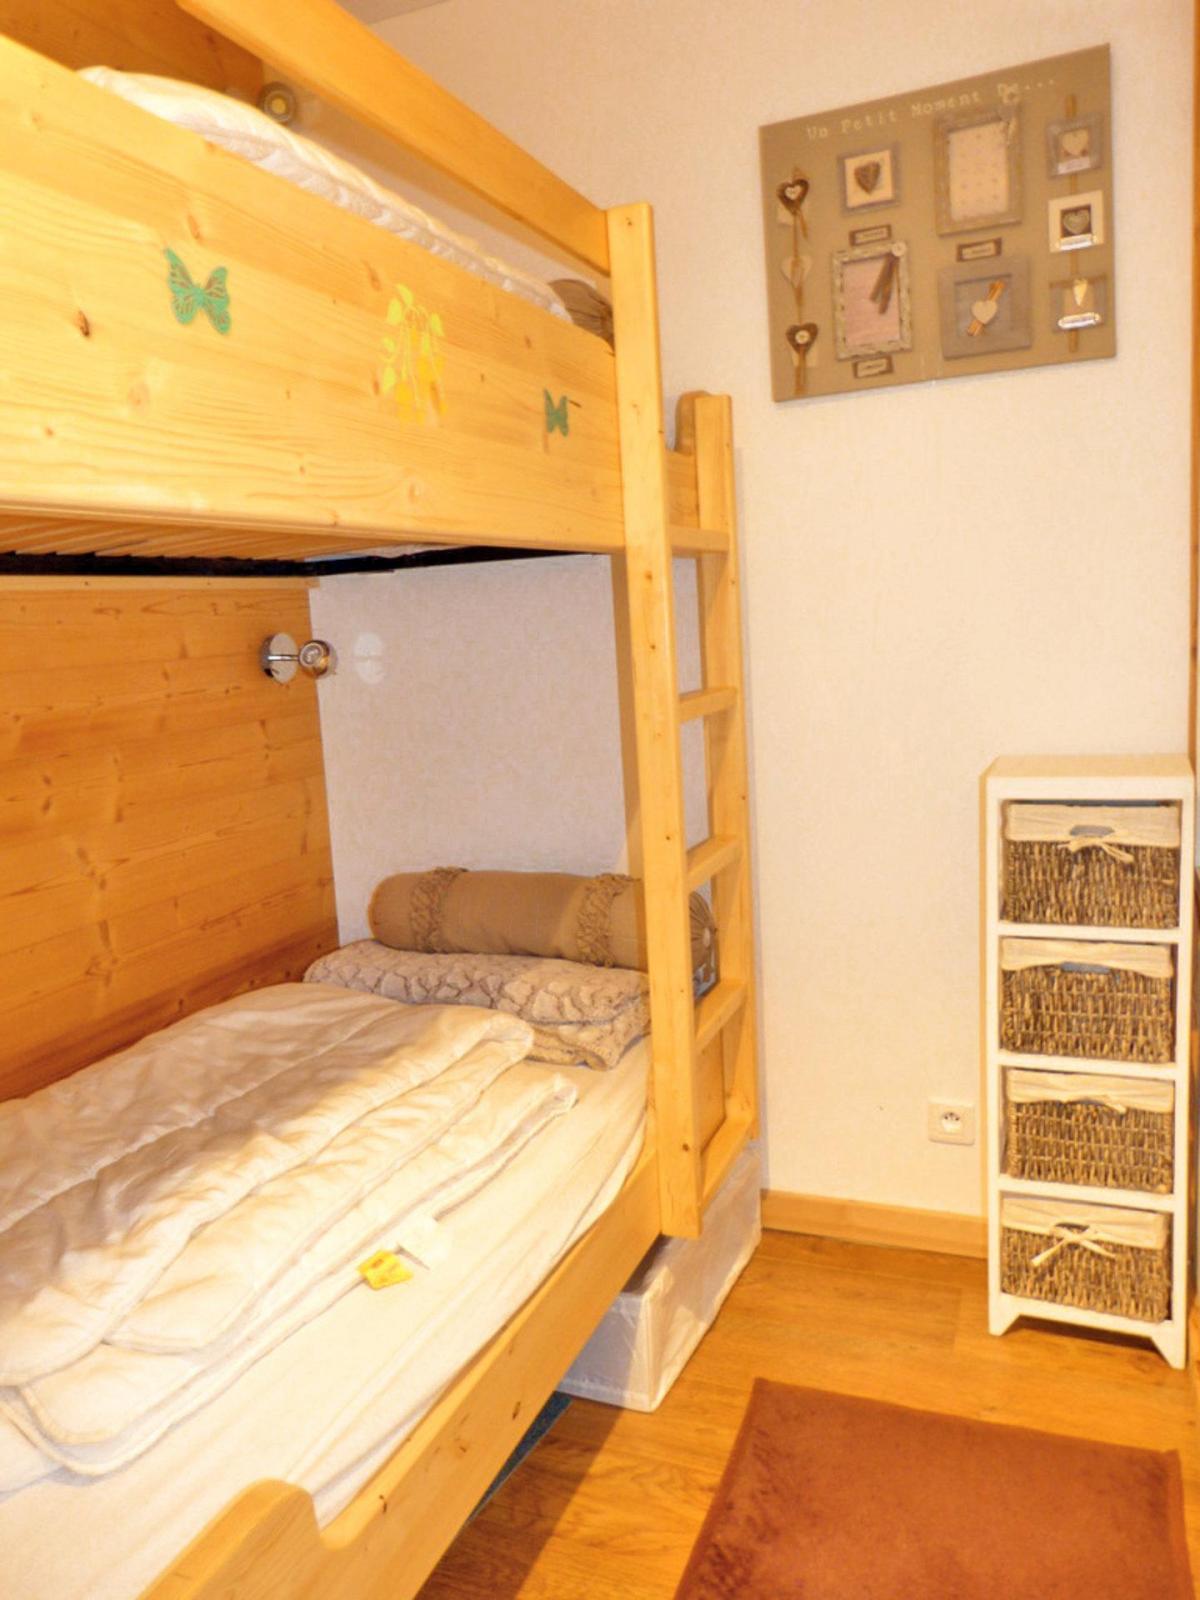 Location au ski Studio cabine 4 personnes (A2H53) - Residence Aime 2000 - Le Diamant - La Plagne - Cabine